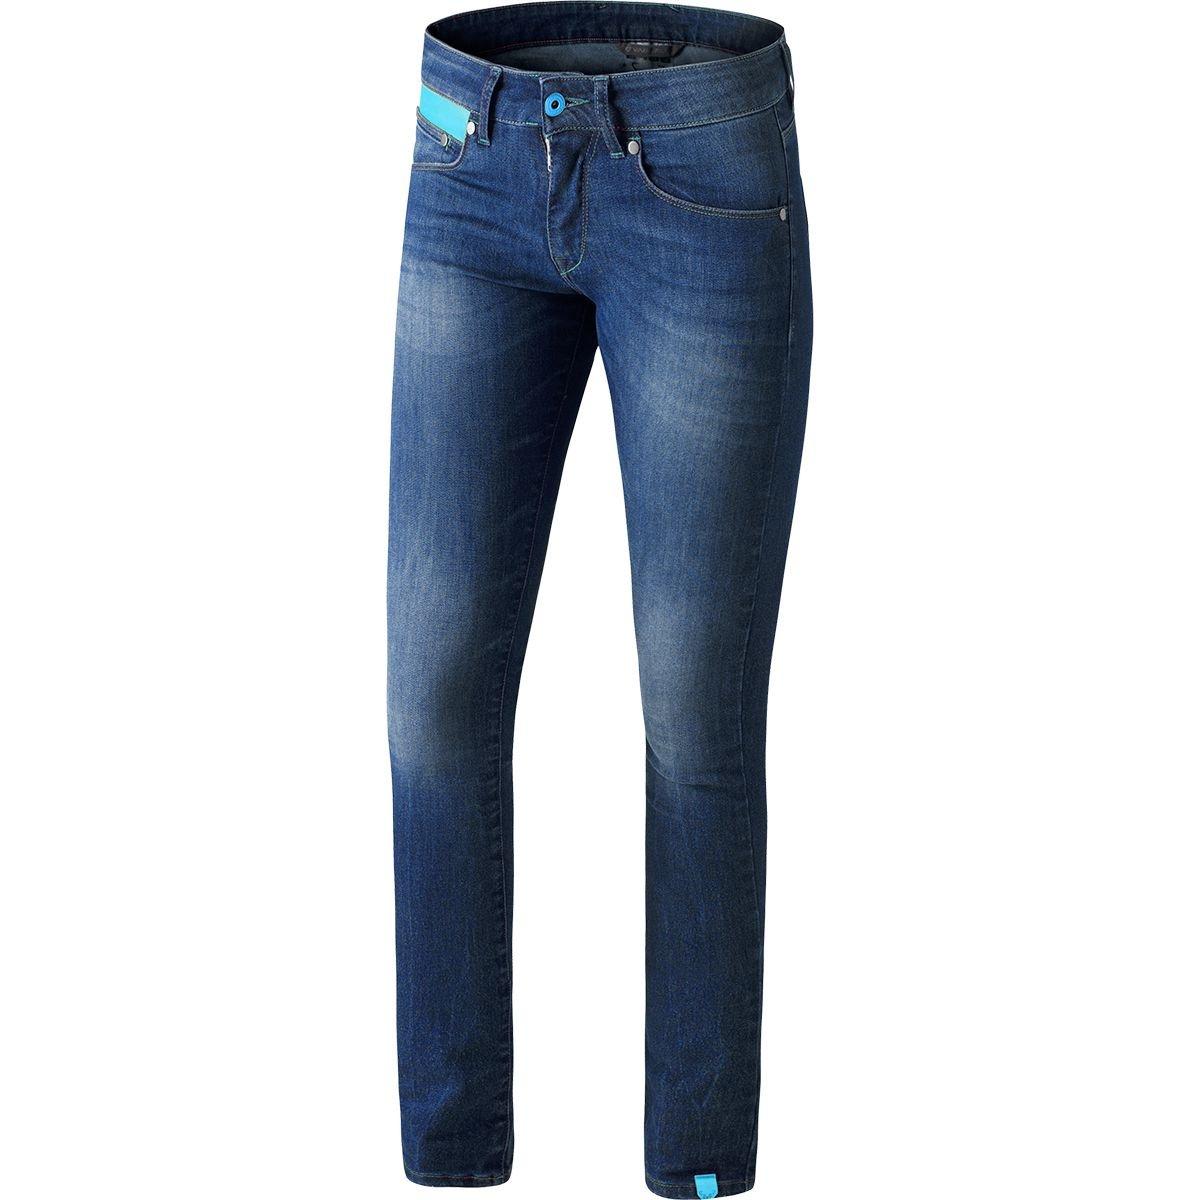 Dynafit 24 7 Jeans Damens - Jeans Blau